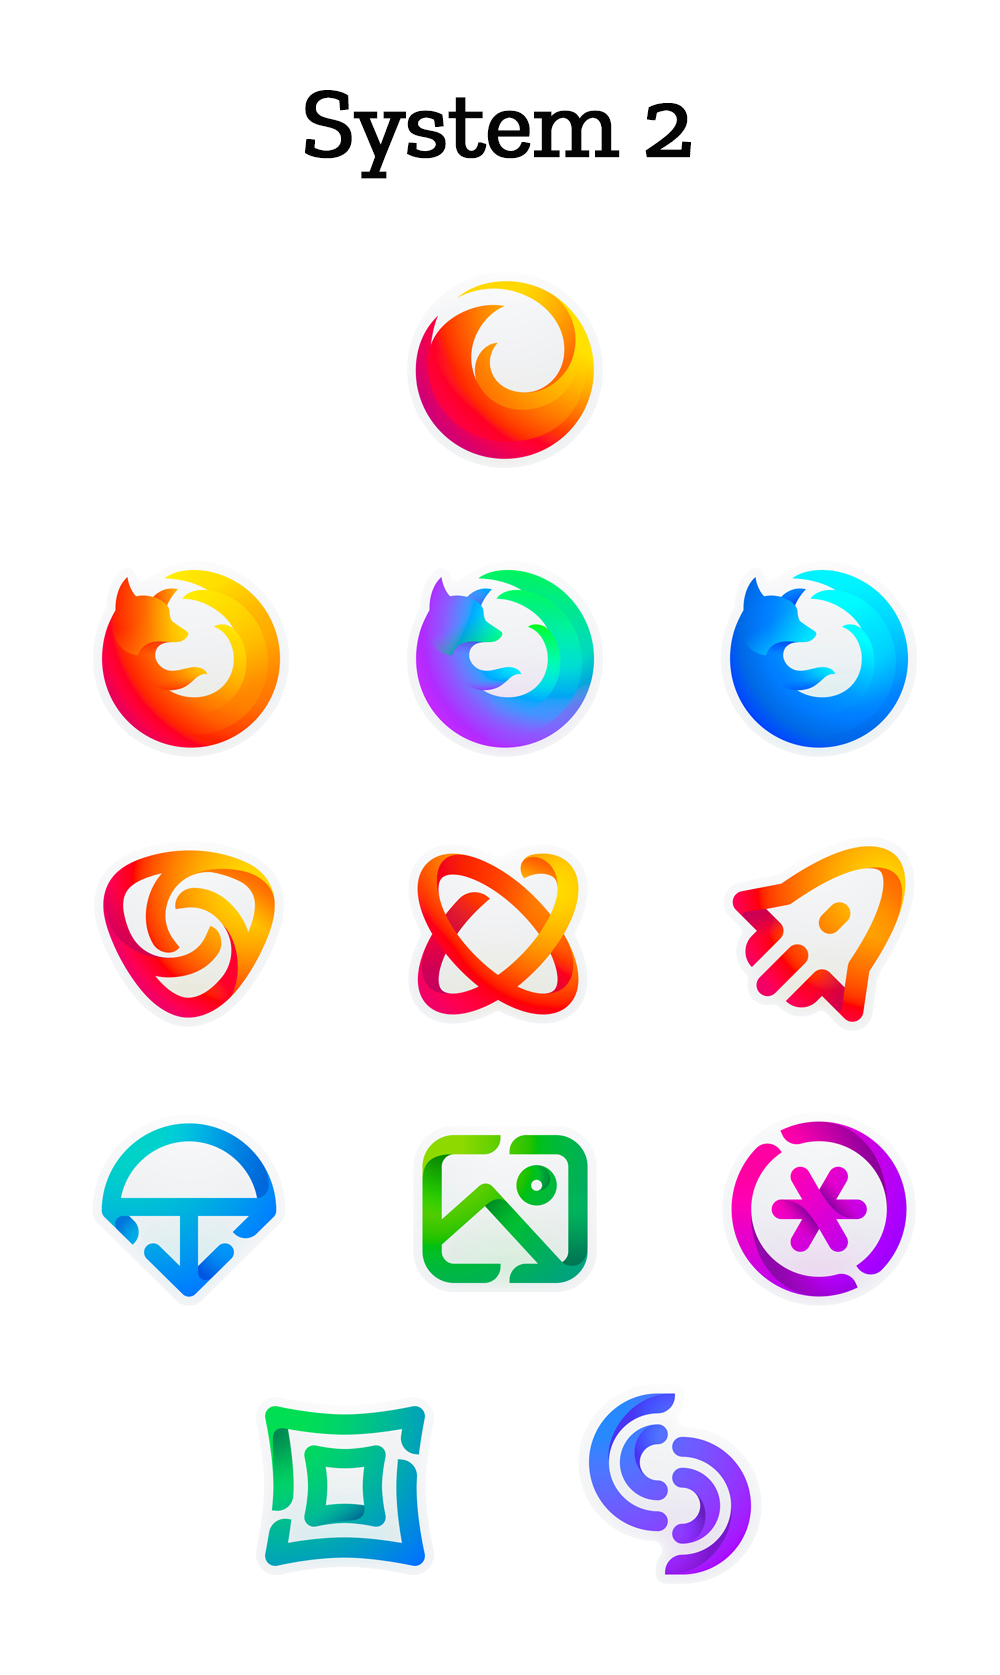 mozilla、firefoxシリーズのロゴを刷新する計画を発表 : 0を1にする